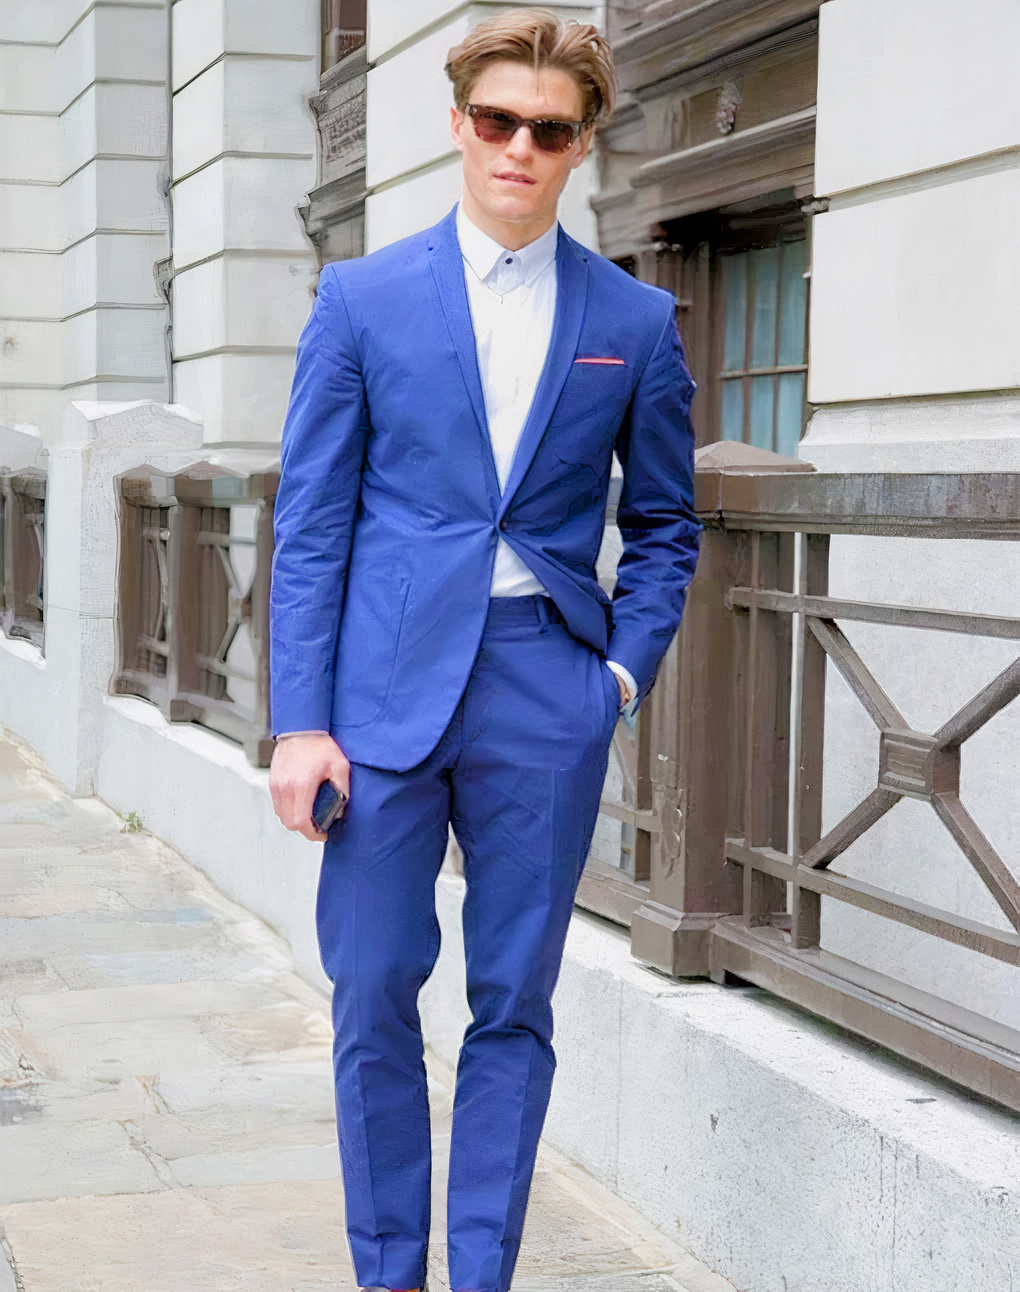 Blue suit and white shirt color combination